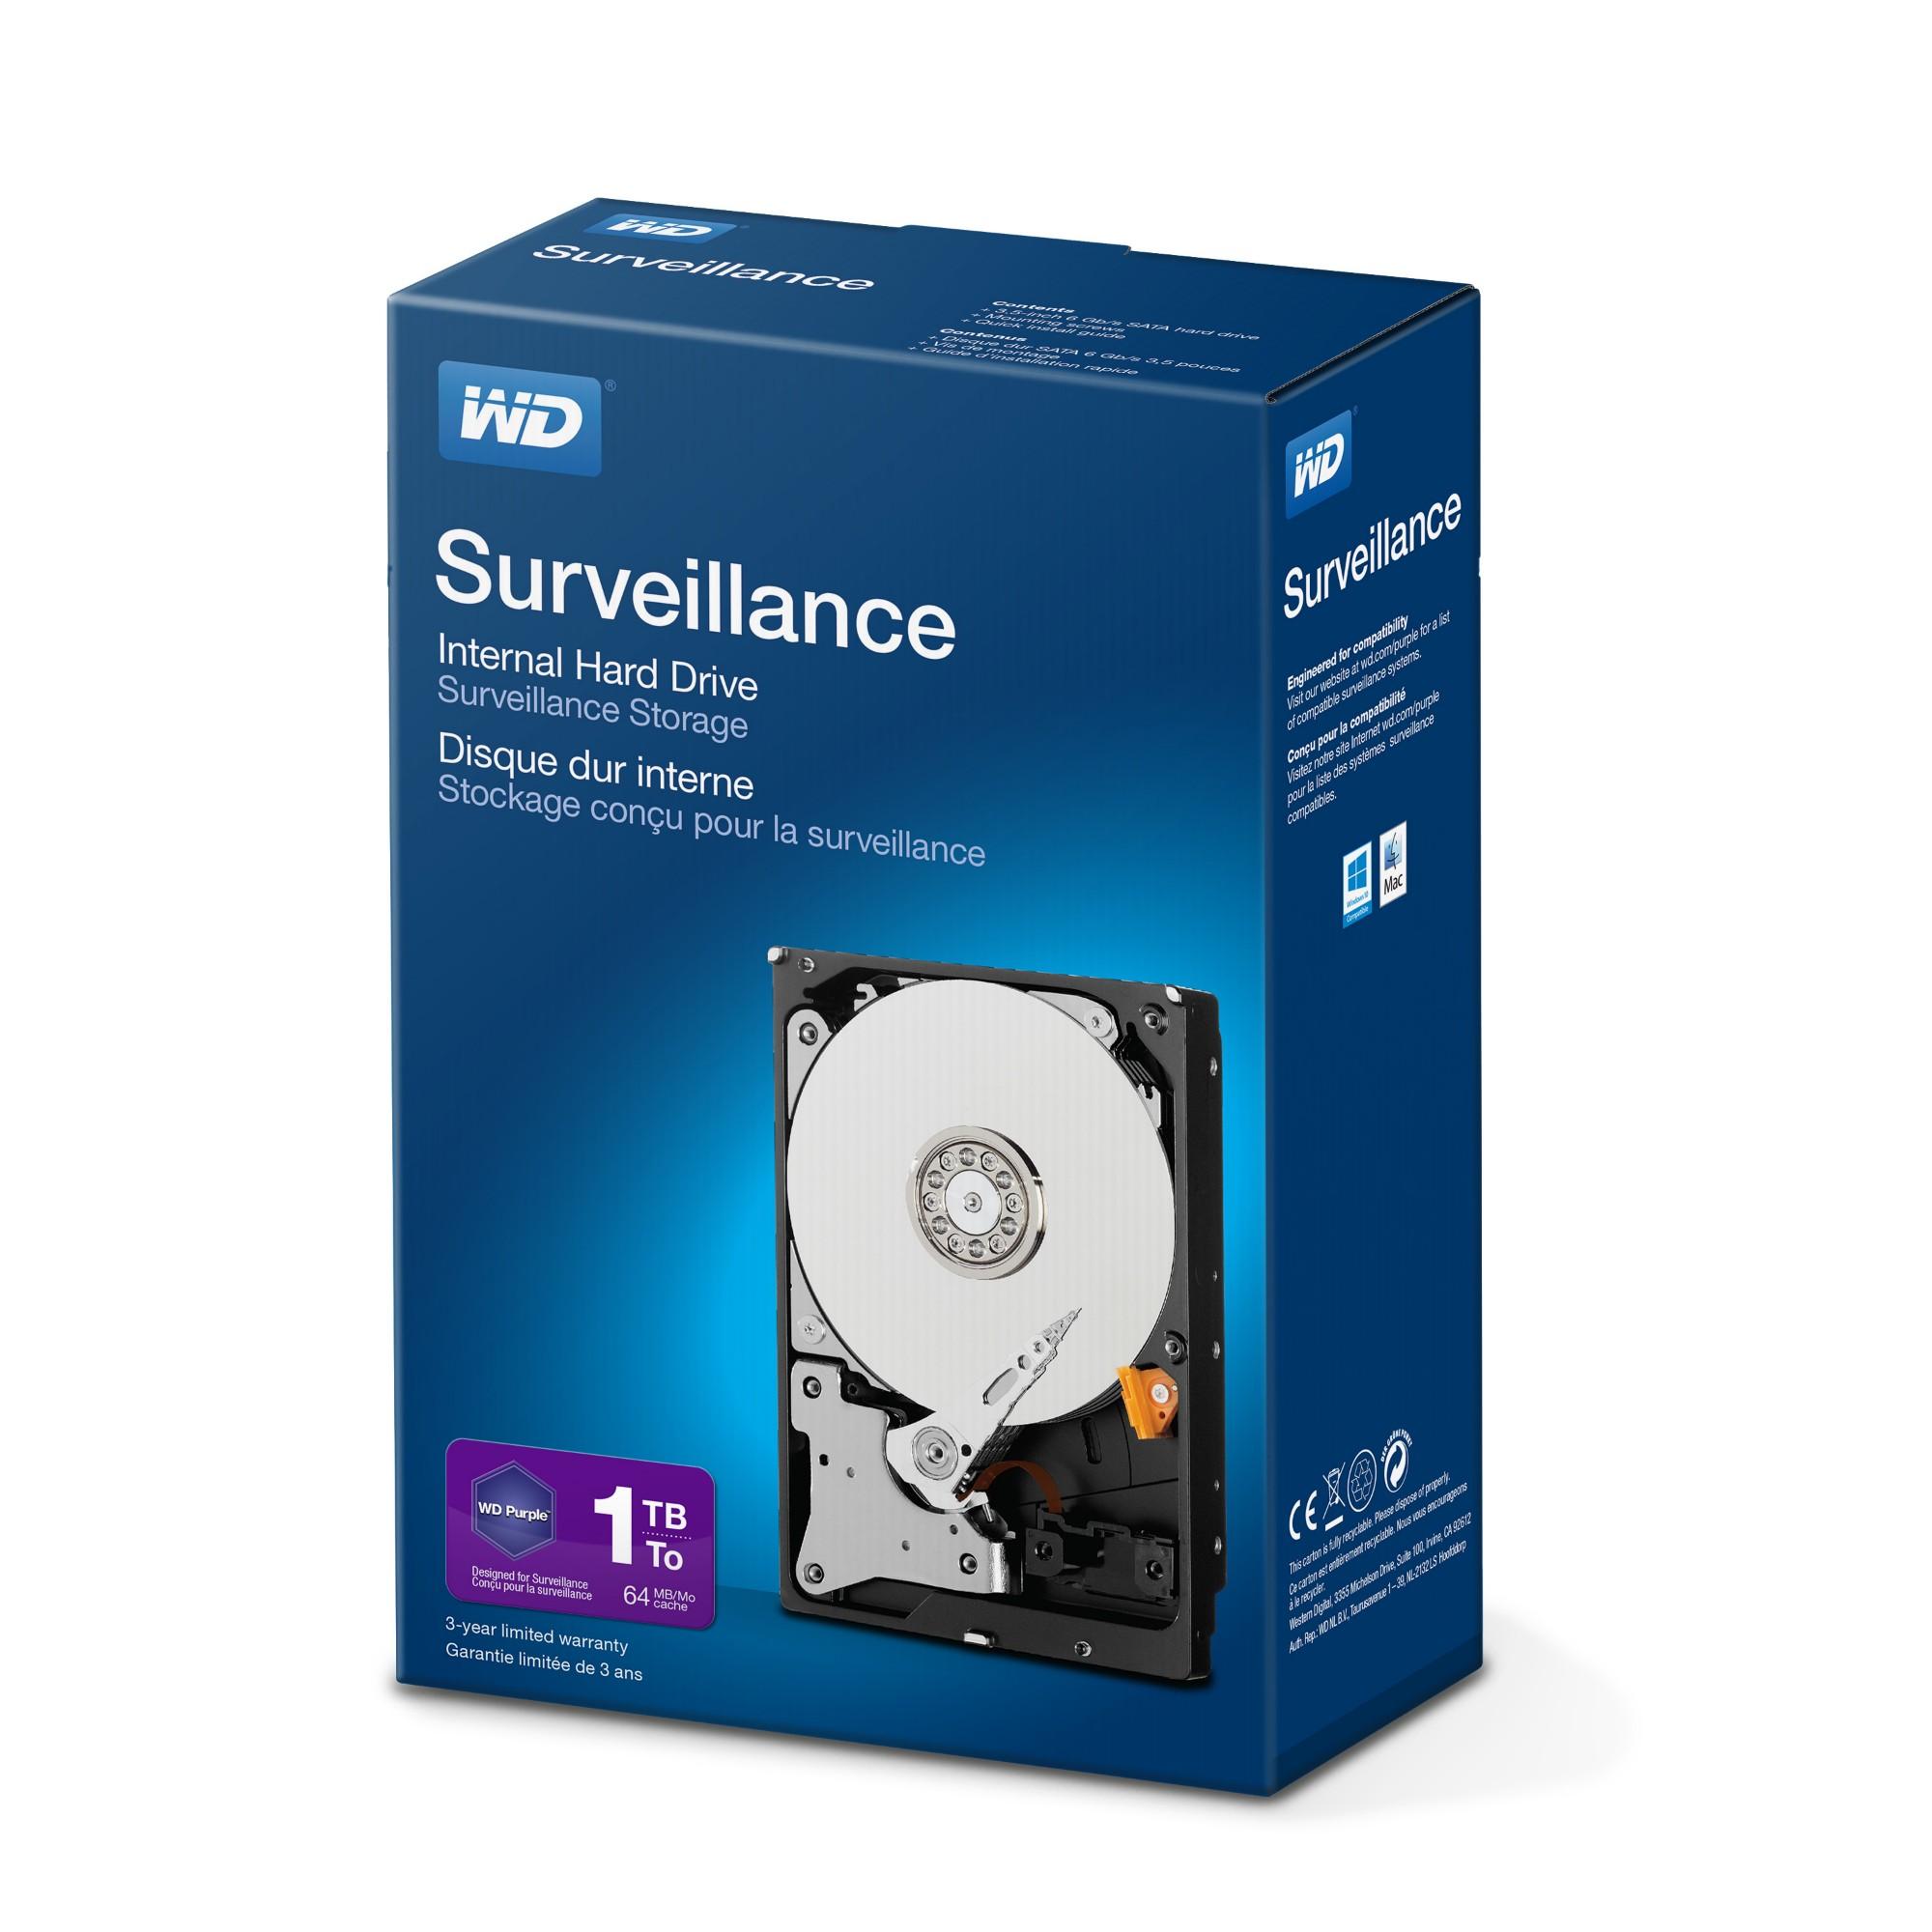 Western Digital Surveillance Storage 1000GB Serial ATA III internal hard drive